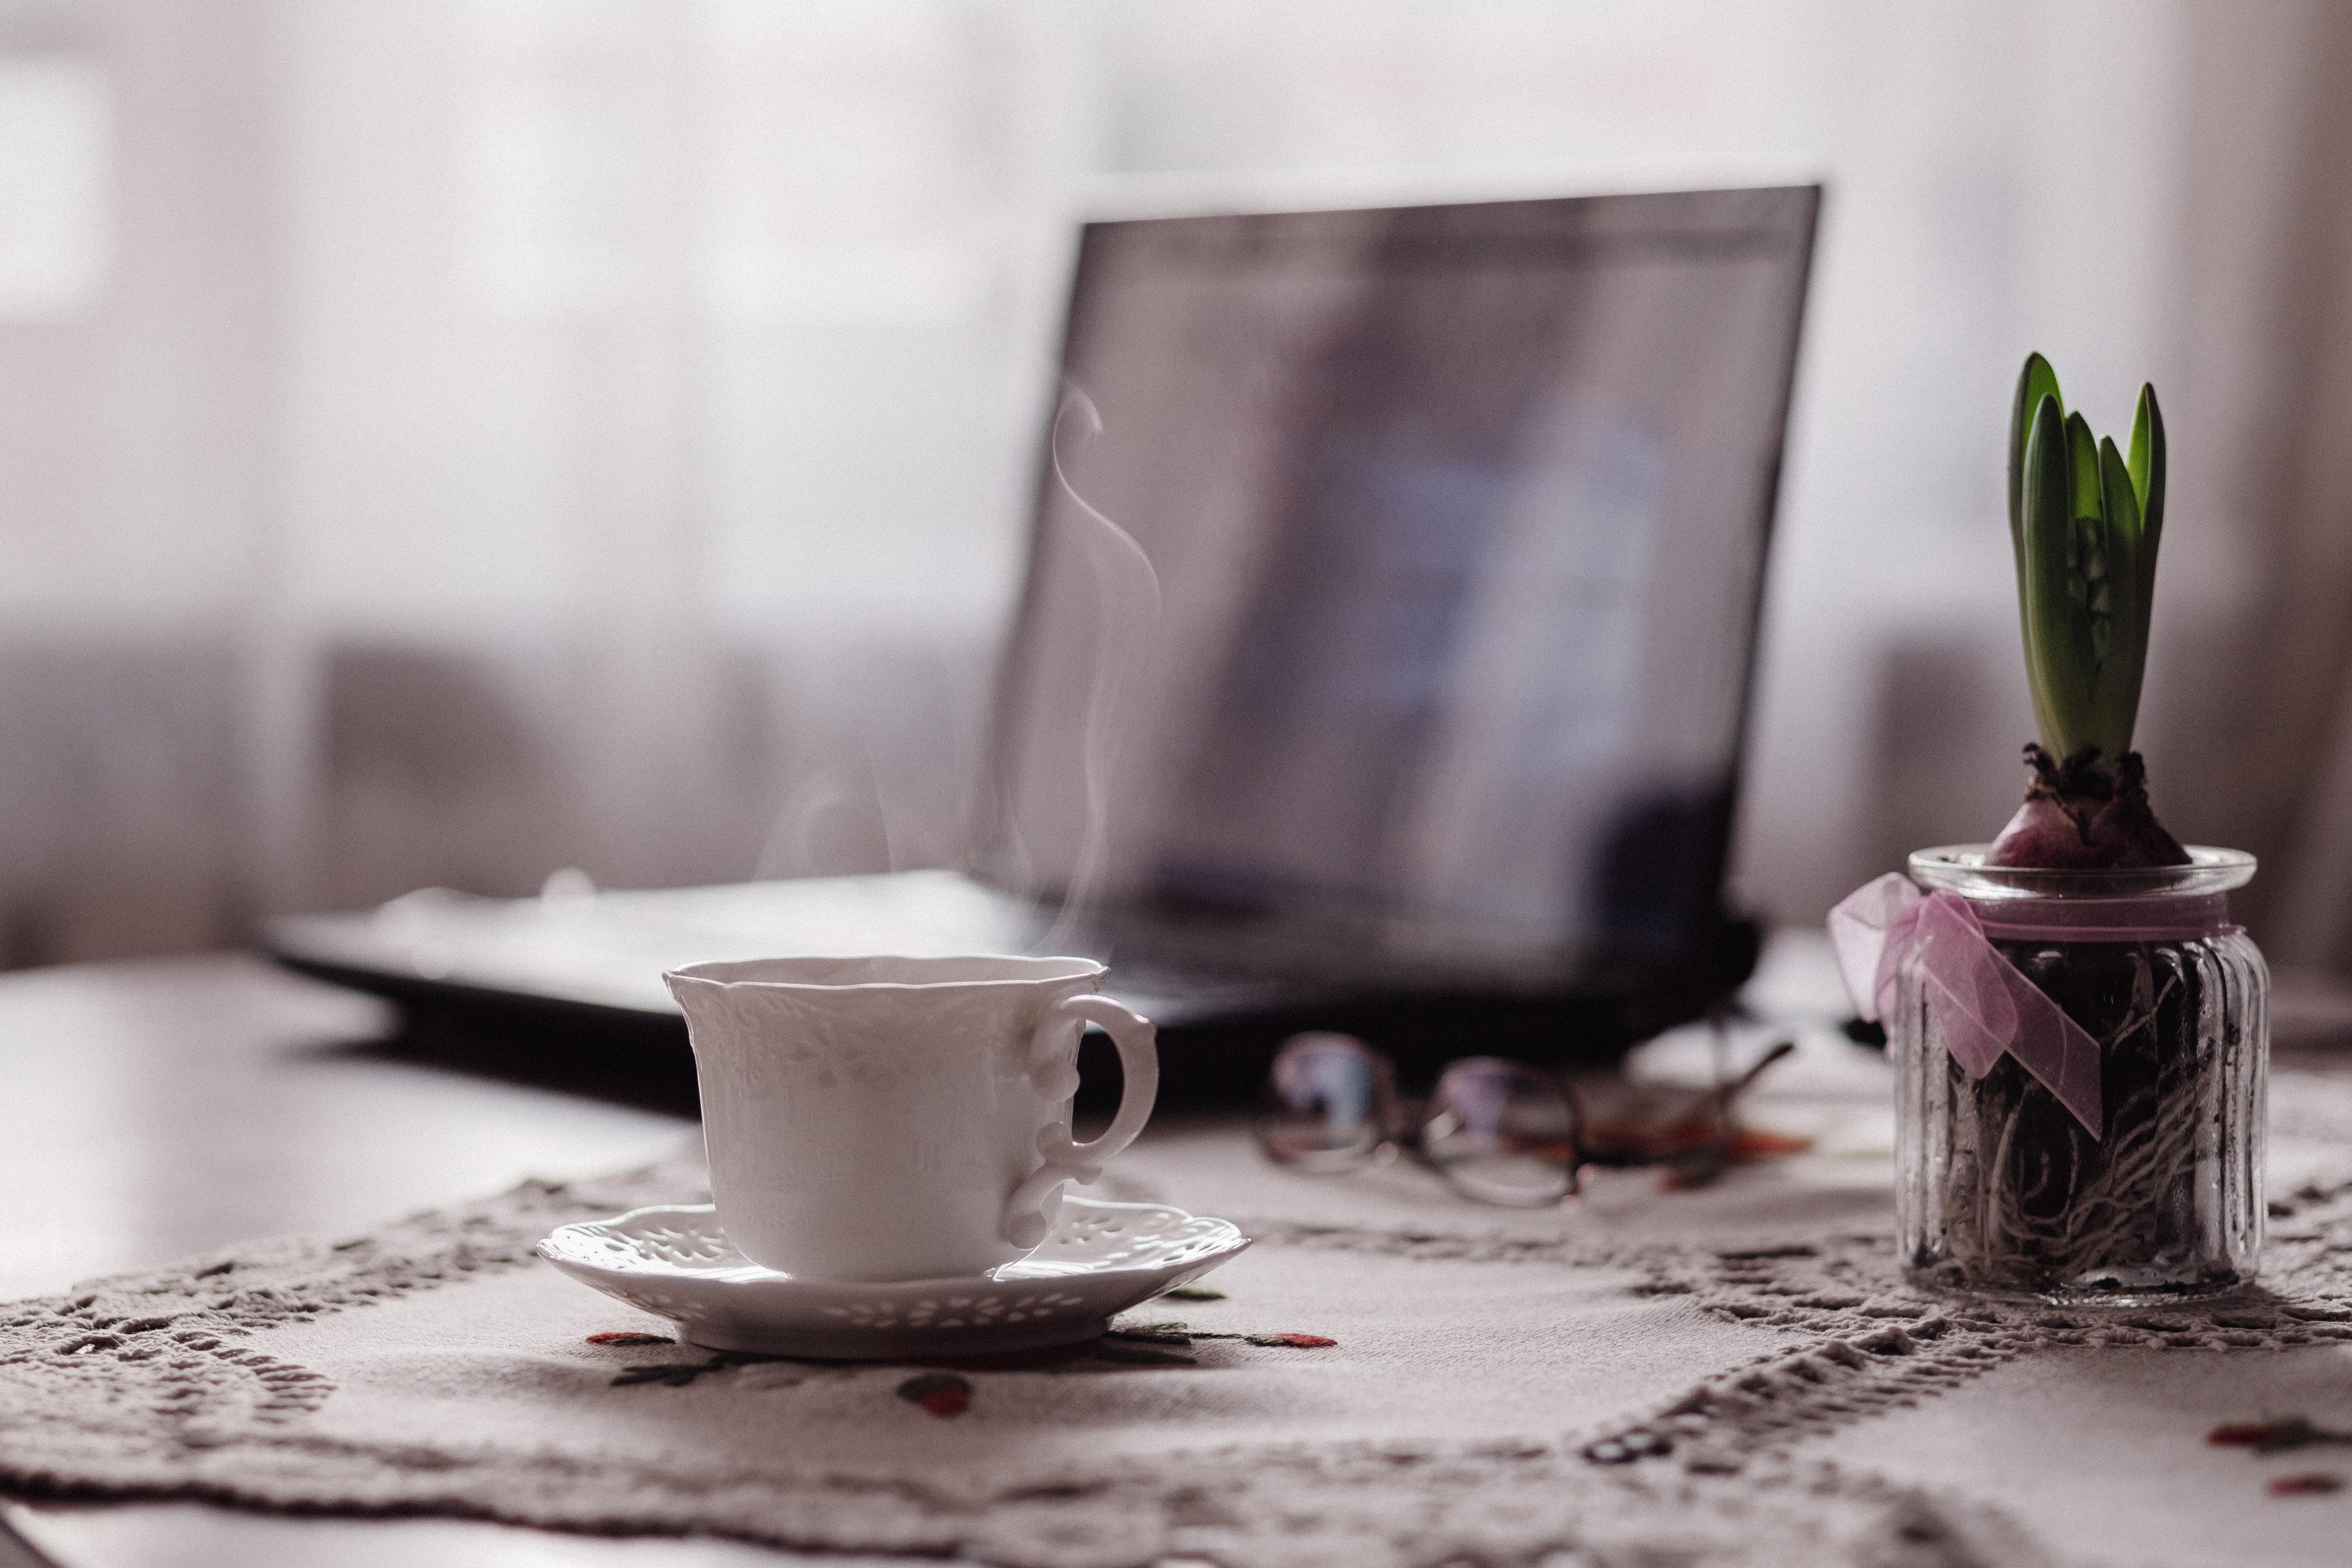 Close-up of Coffee on Table, Blur, Restaurant, Wedding, Tea, HQ Photo